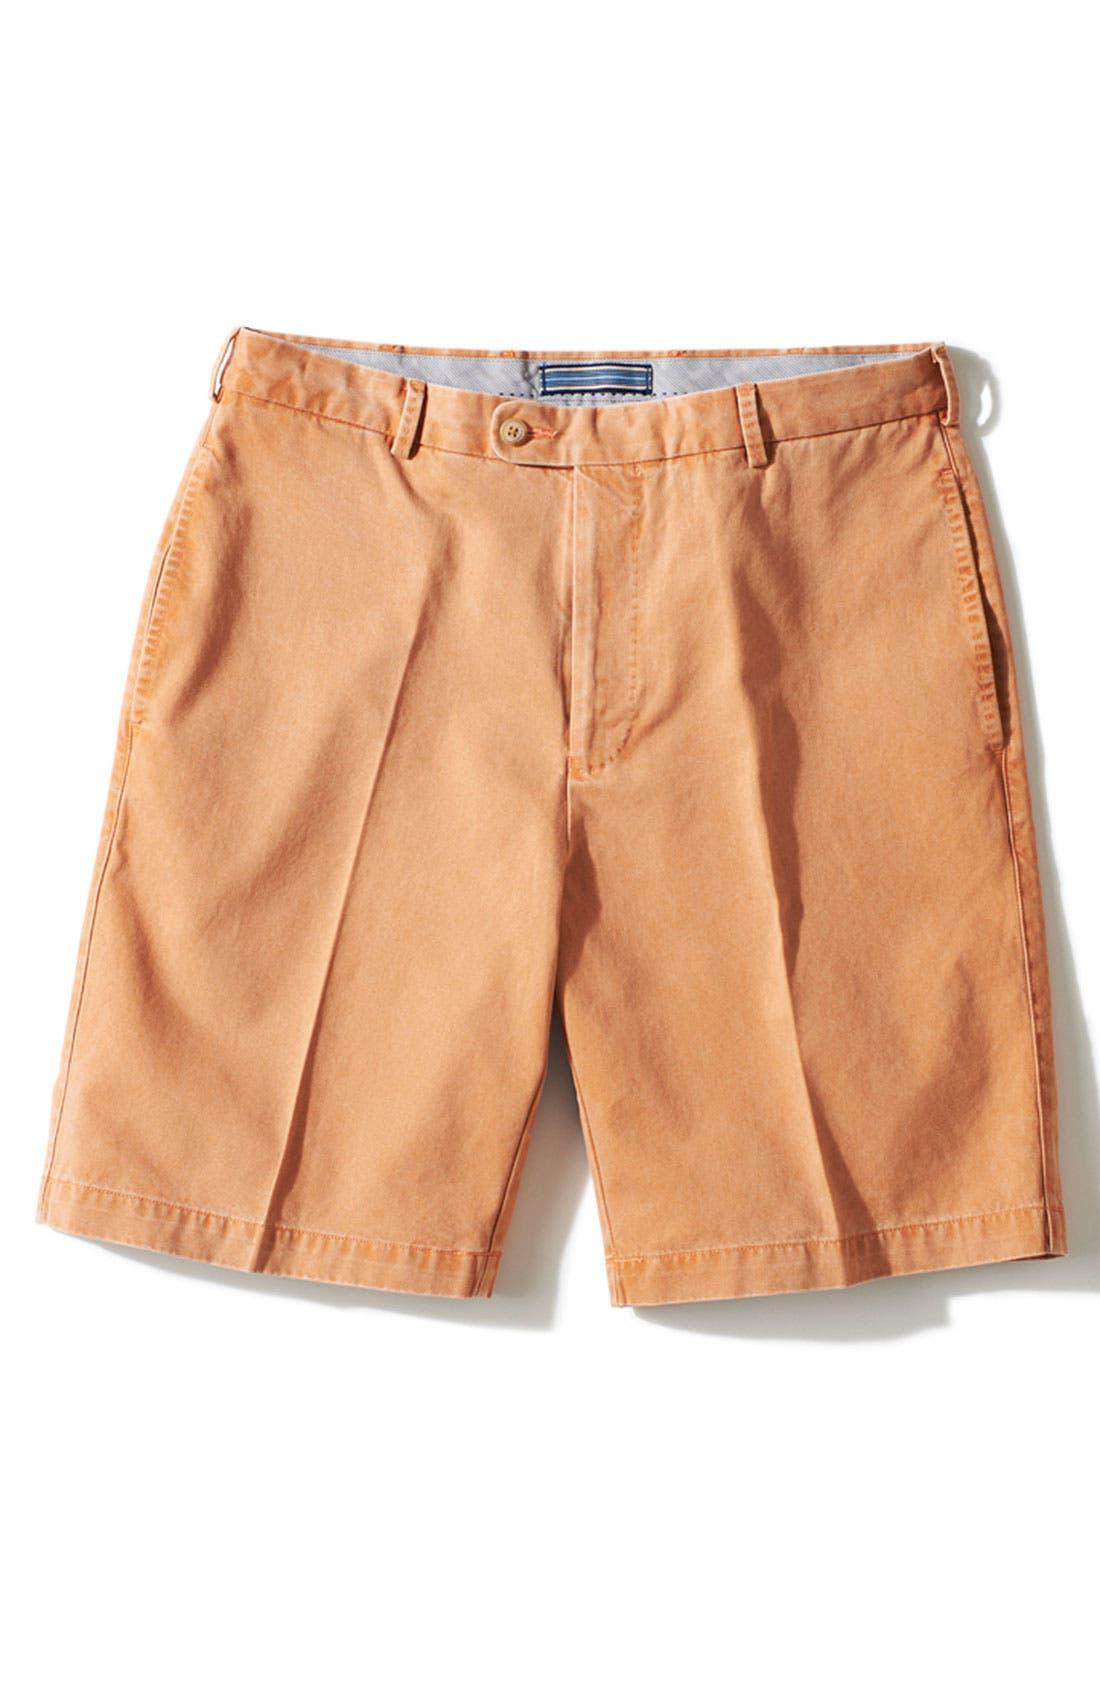 Alternate Image 3  - Peter Millar Washed Twill Shorts